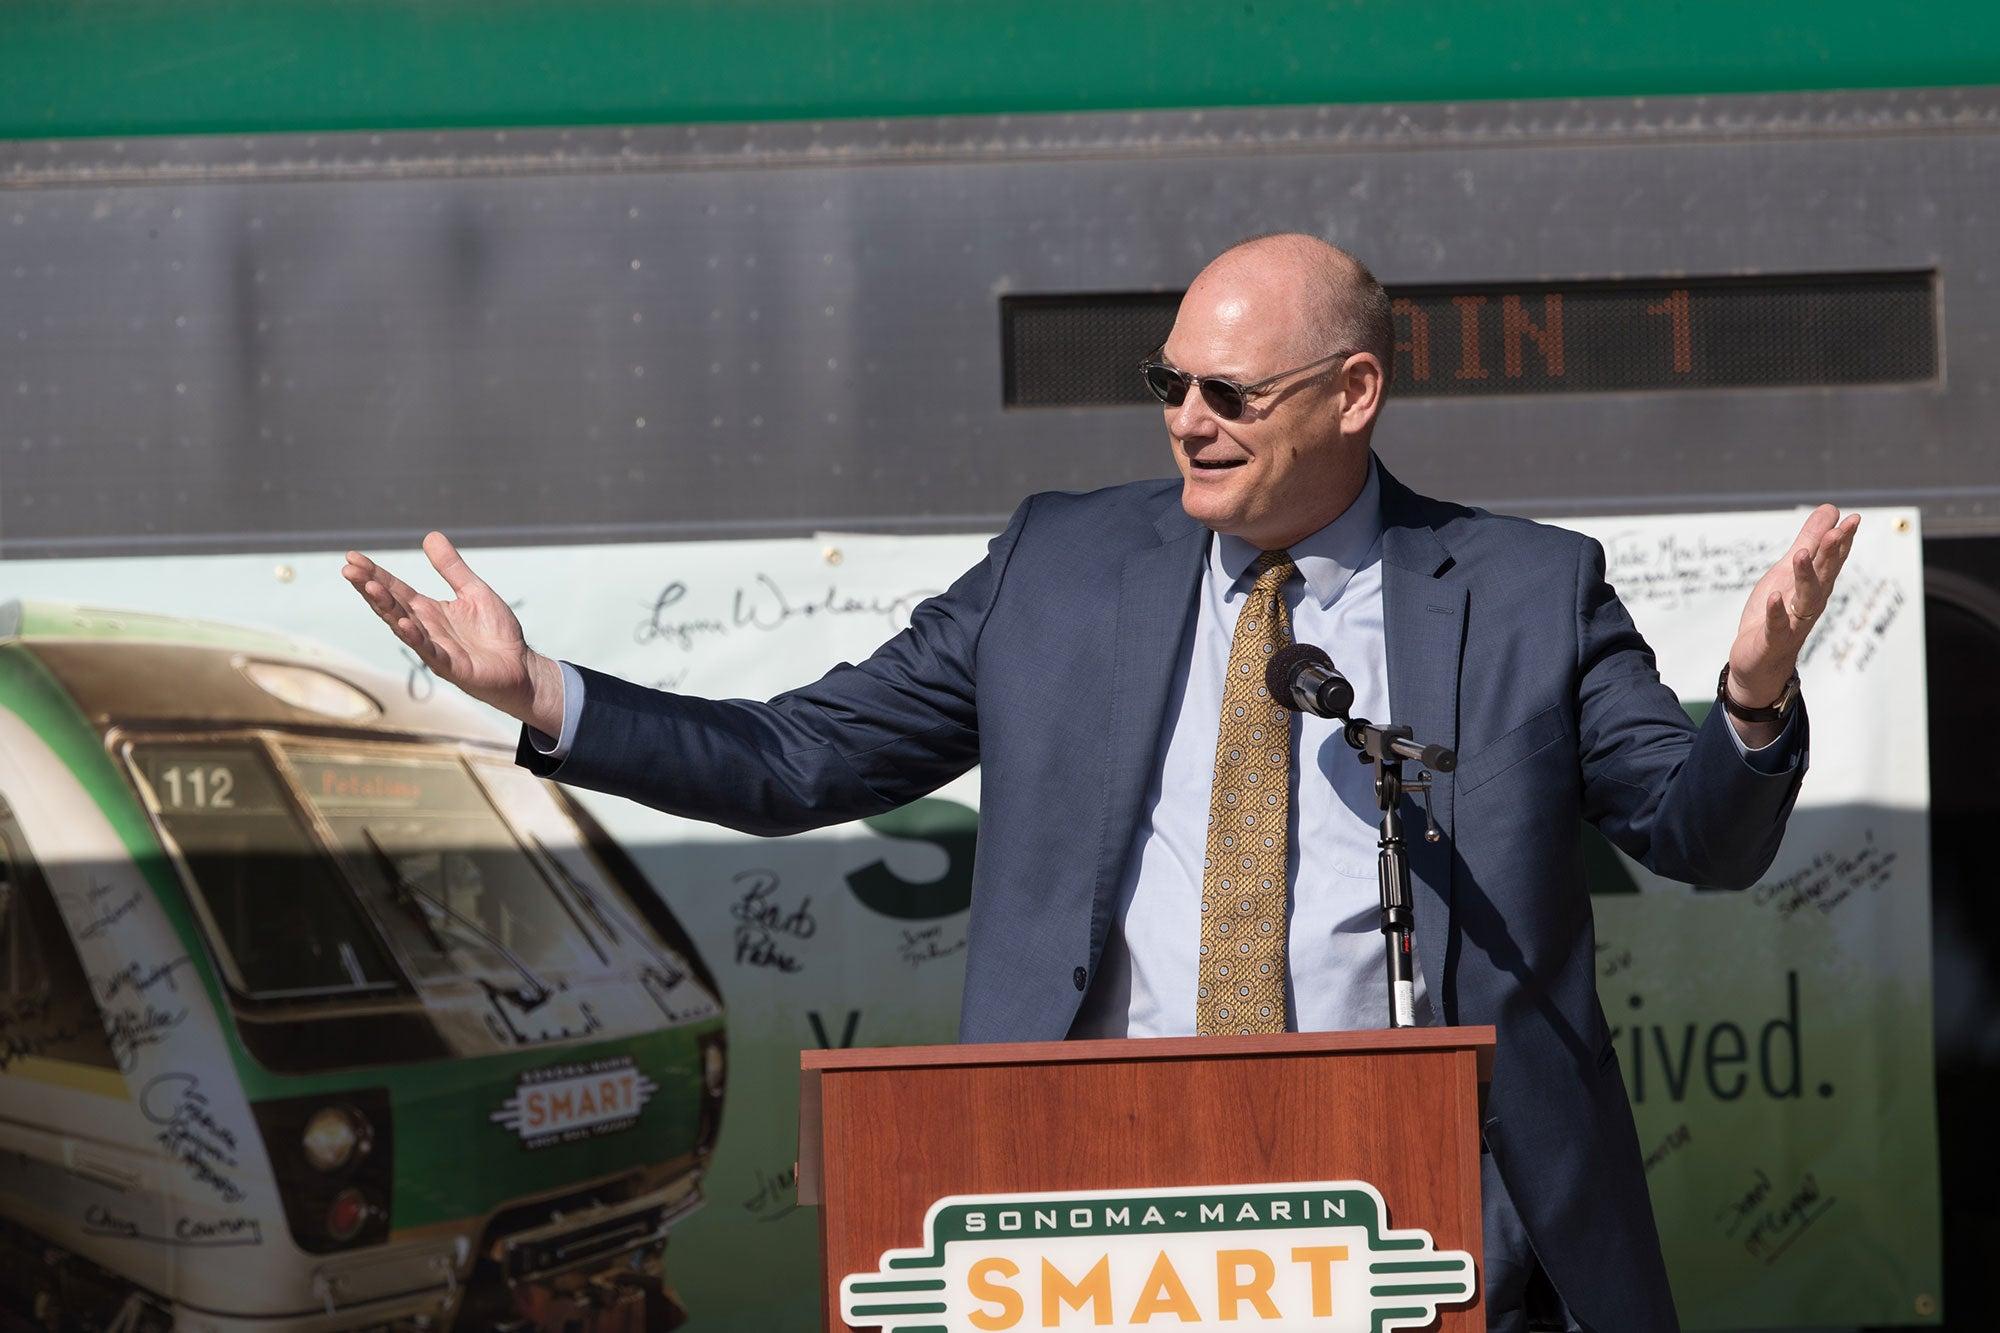 California Secretary of Transportation Brian Kelly